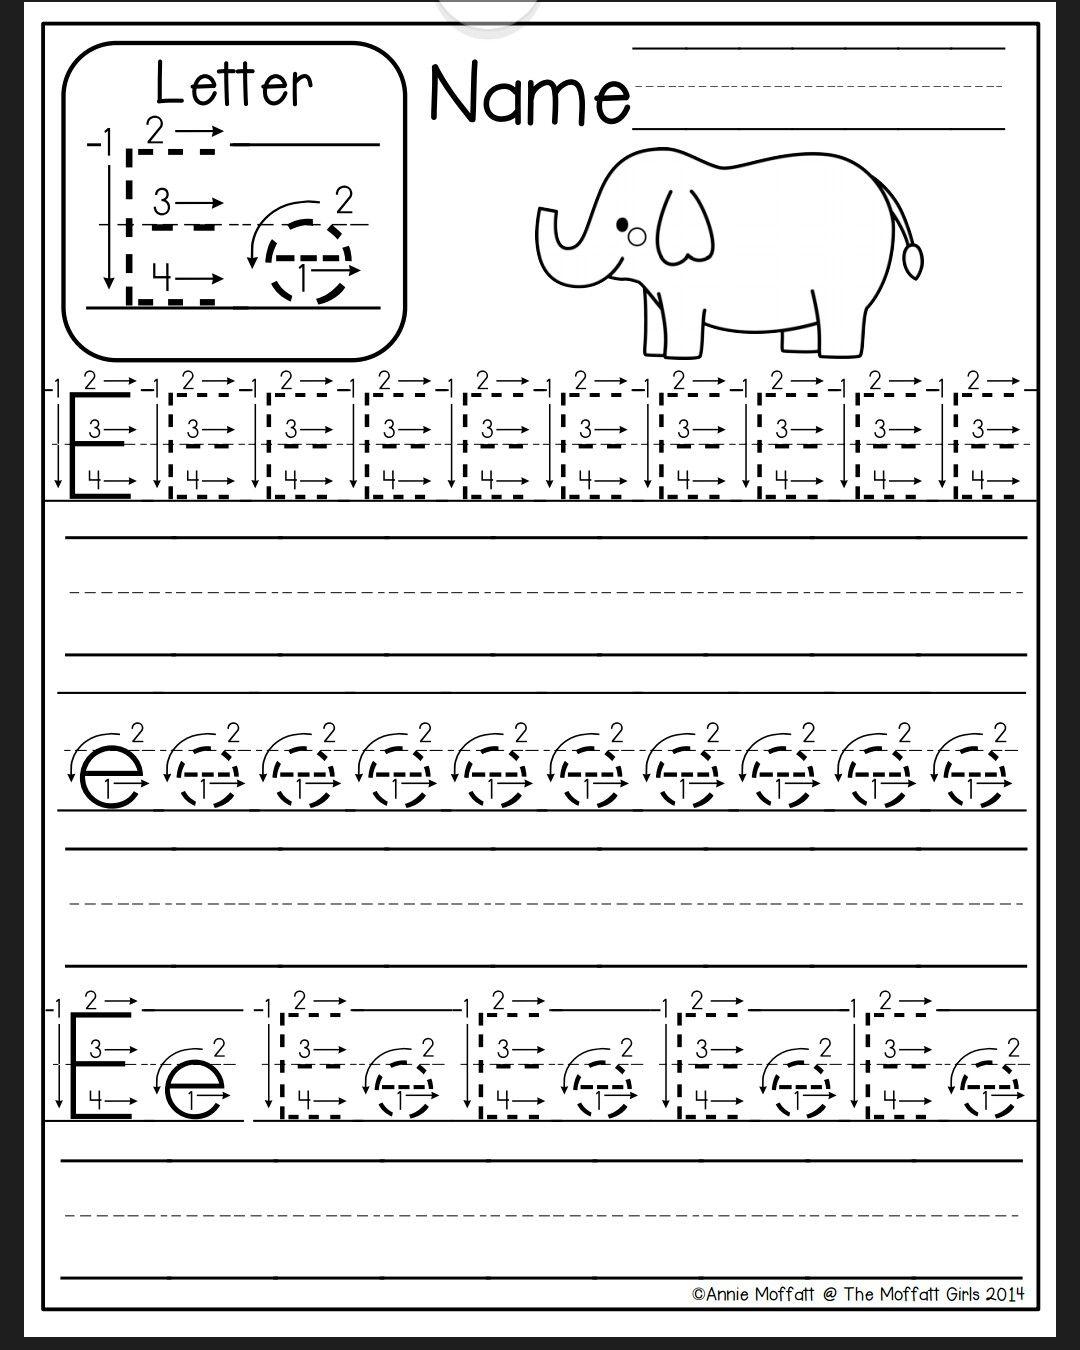 Letter E Worksheet | Preschool Writing, Preschool Letters throughout Tracing Letter E Worksheets